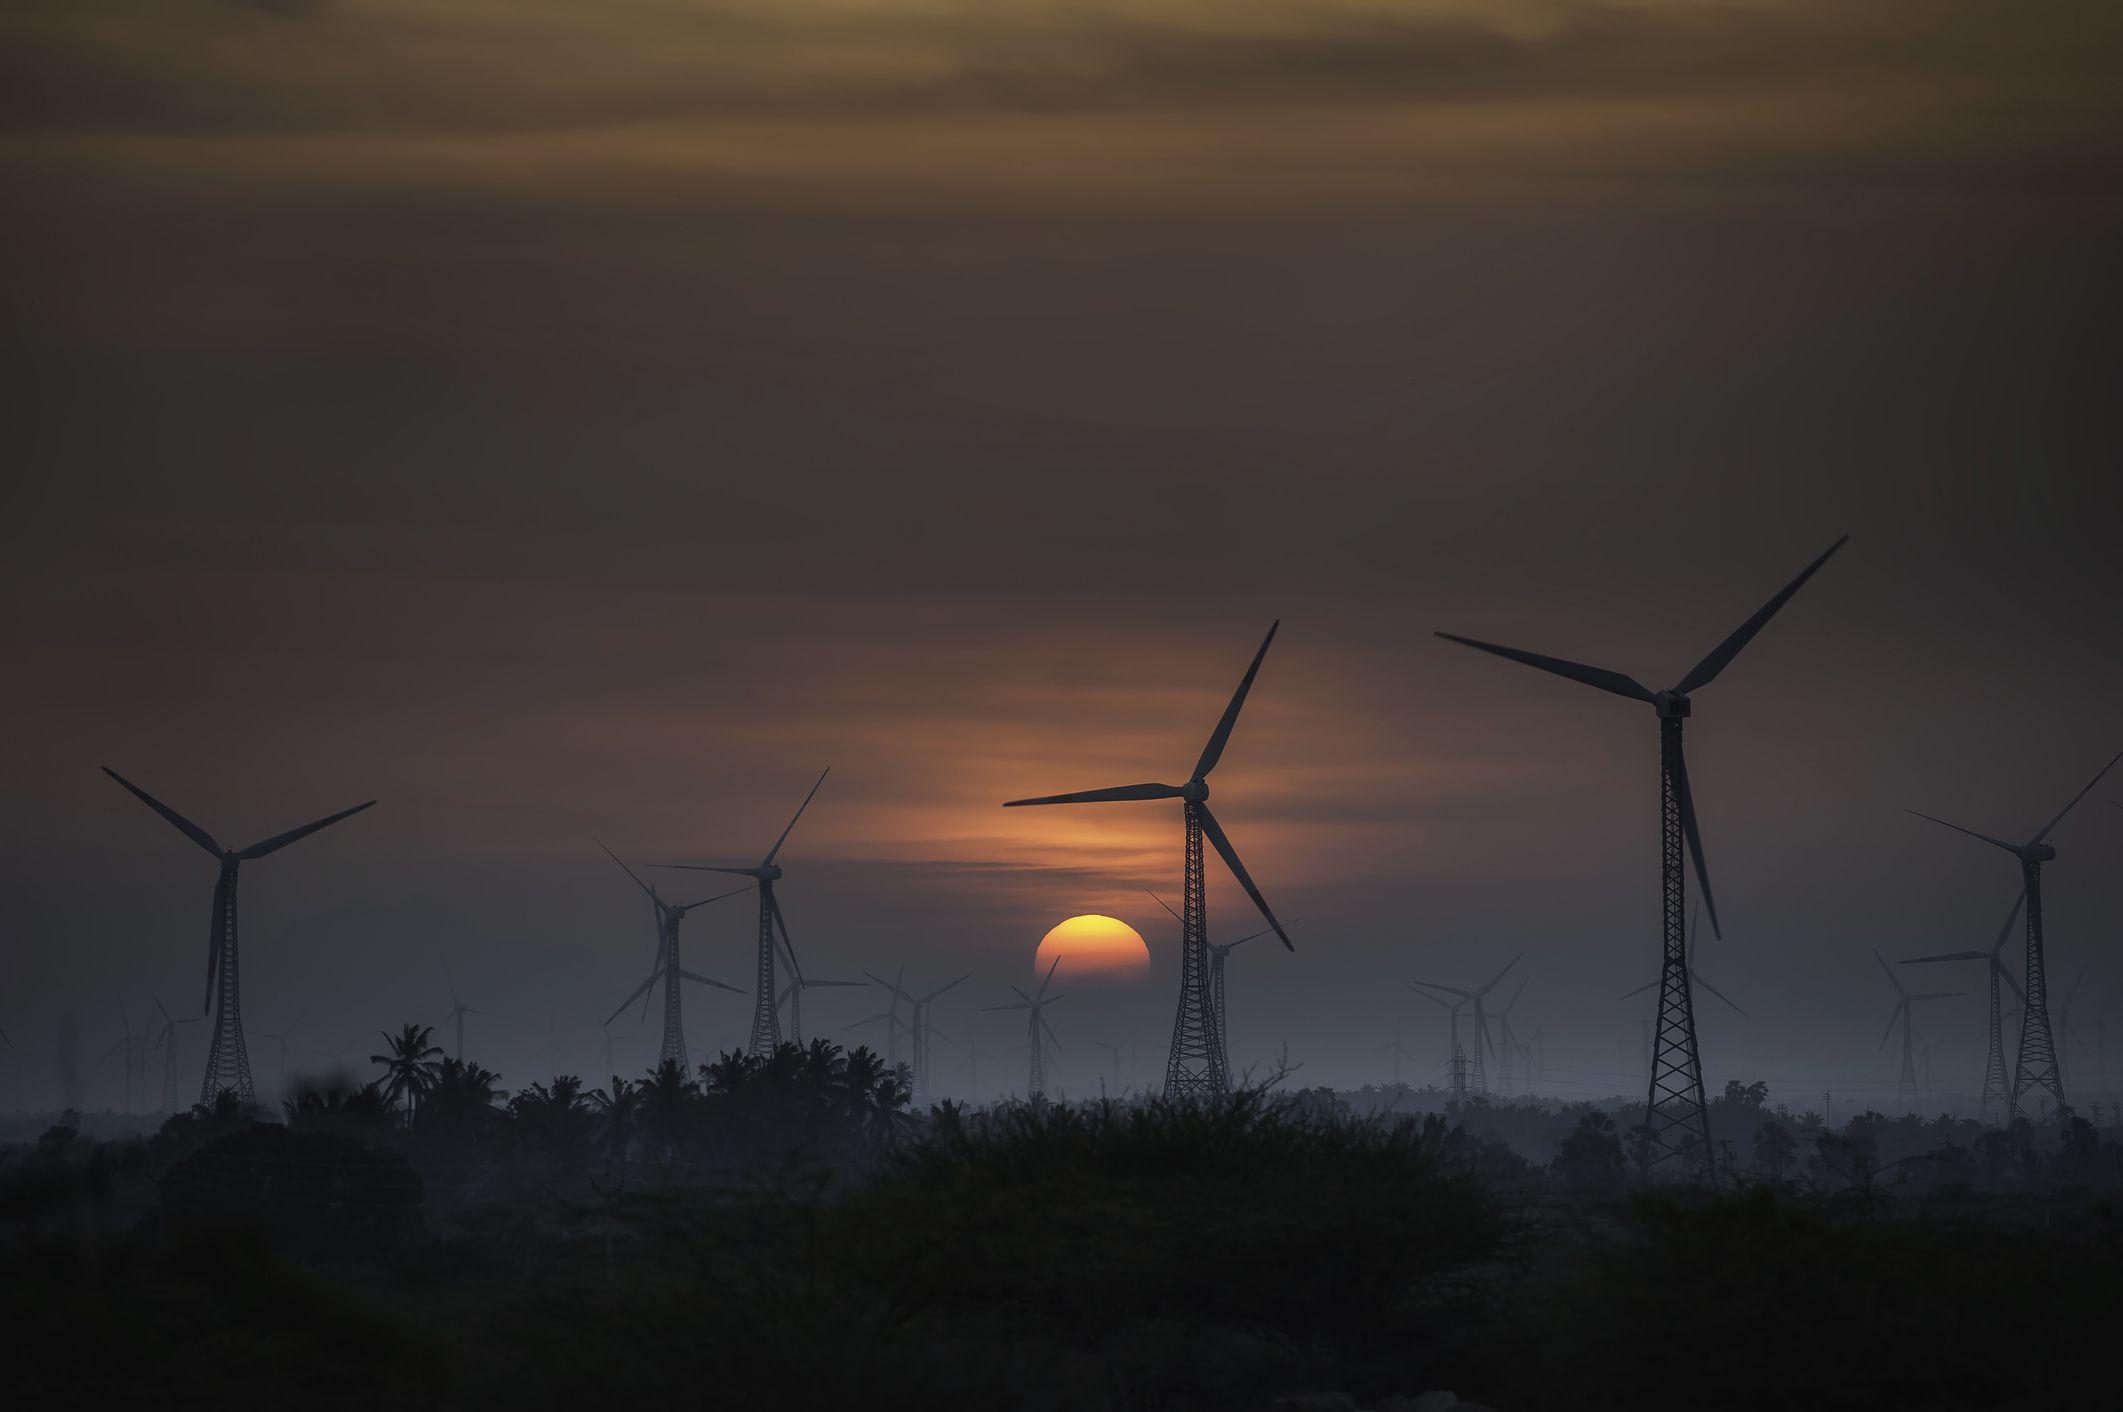 Wind turbines at sunset, Kanyakumari, India